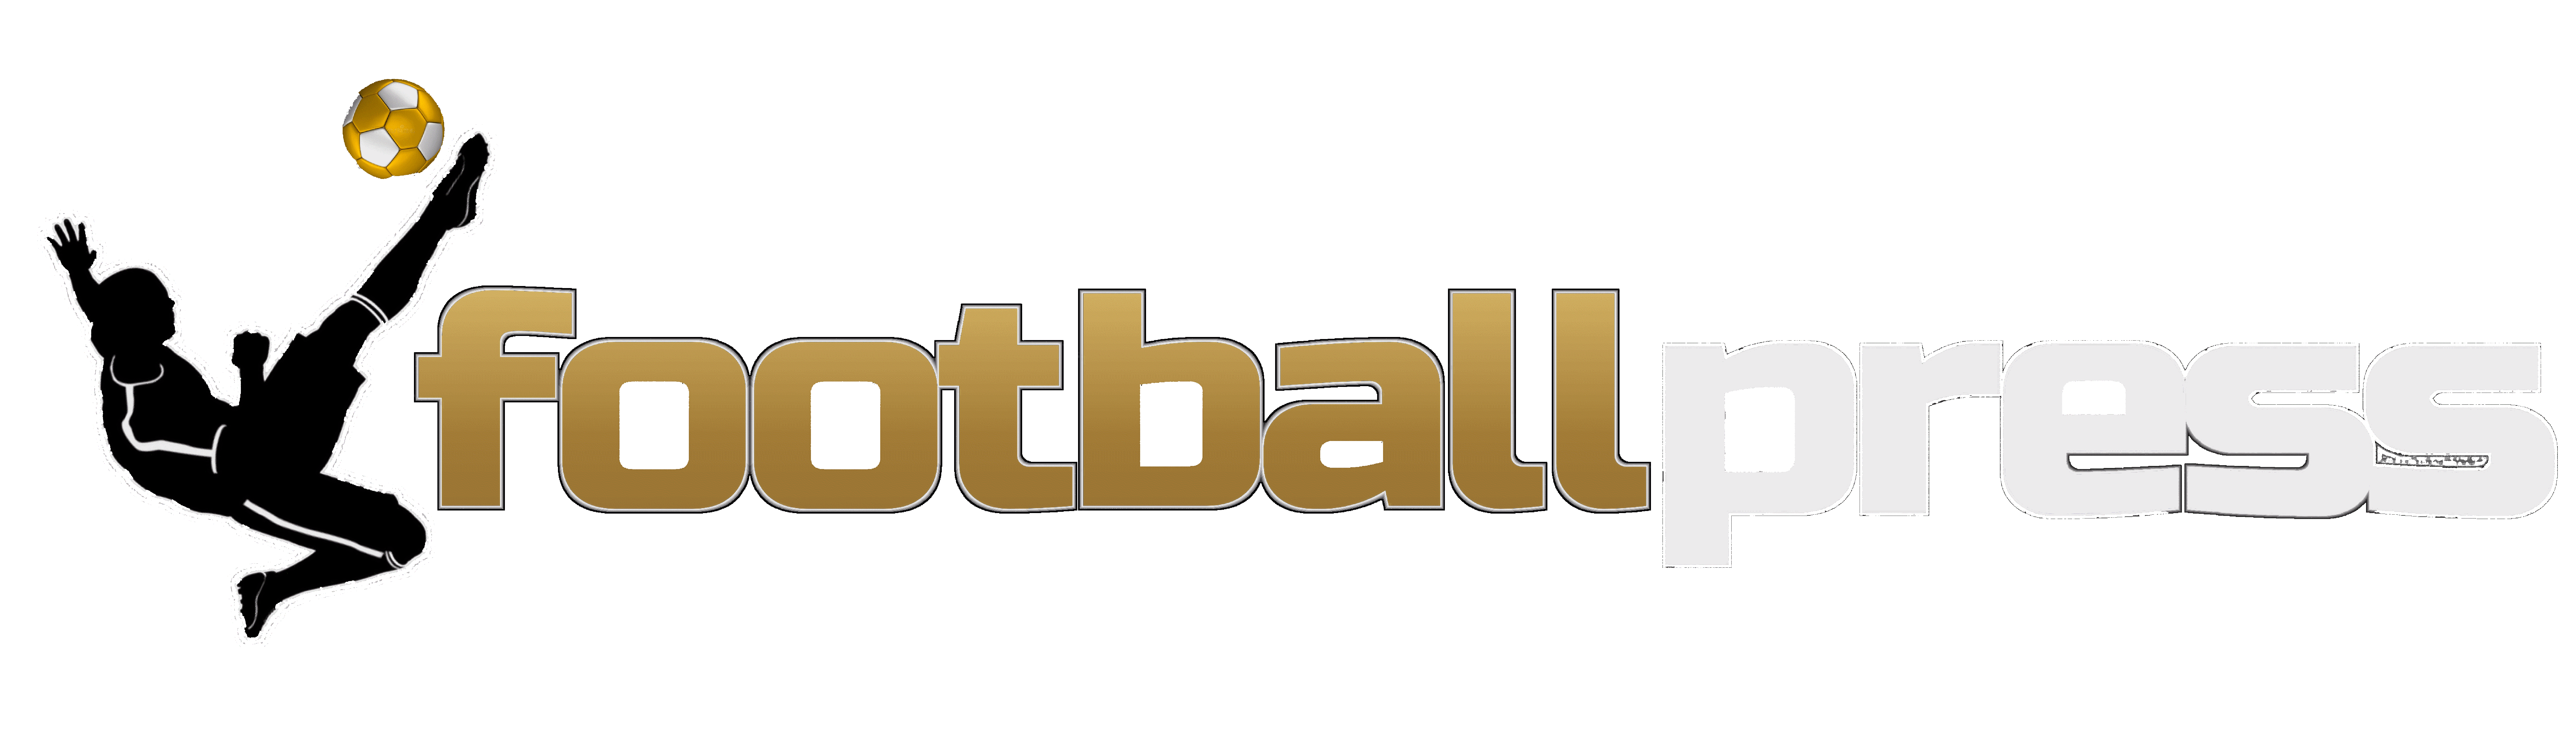 FootballPress by Massimo Ciccognani